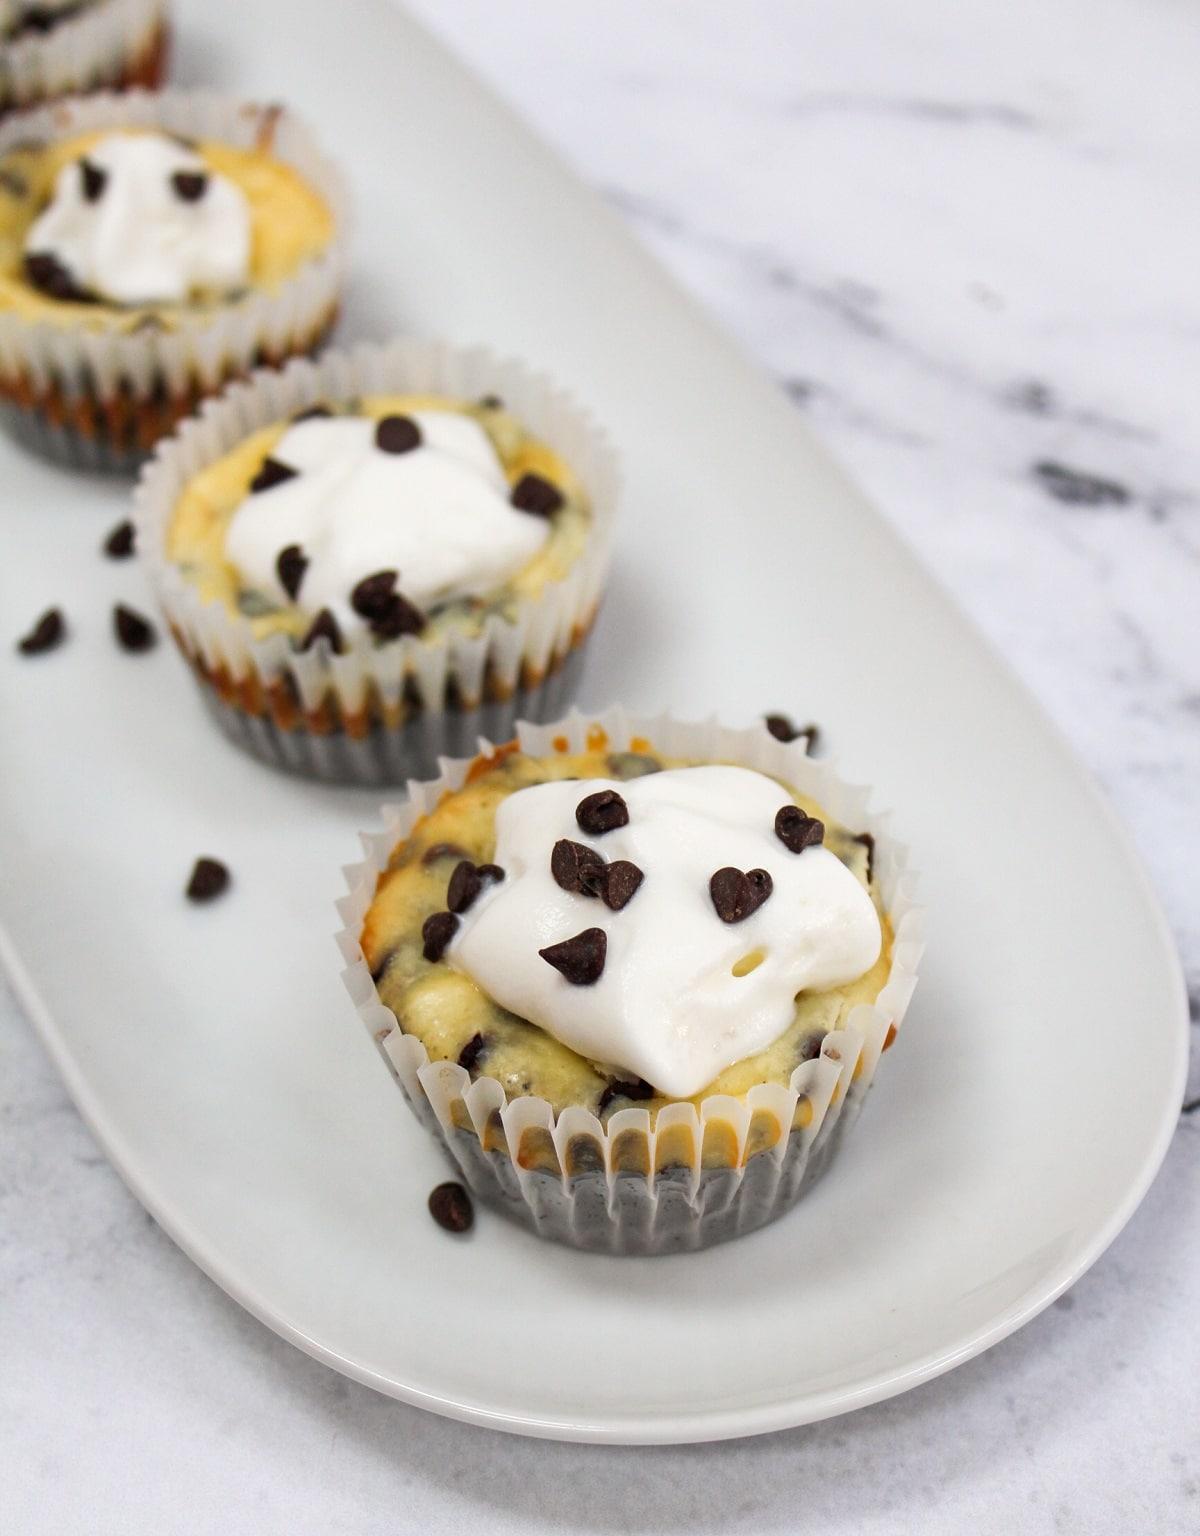 mini chocolate chip cheesecake on white plate